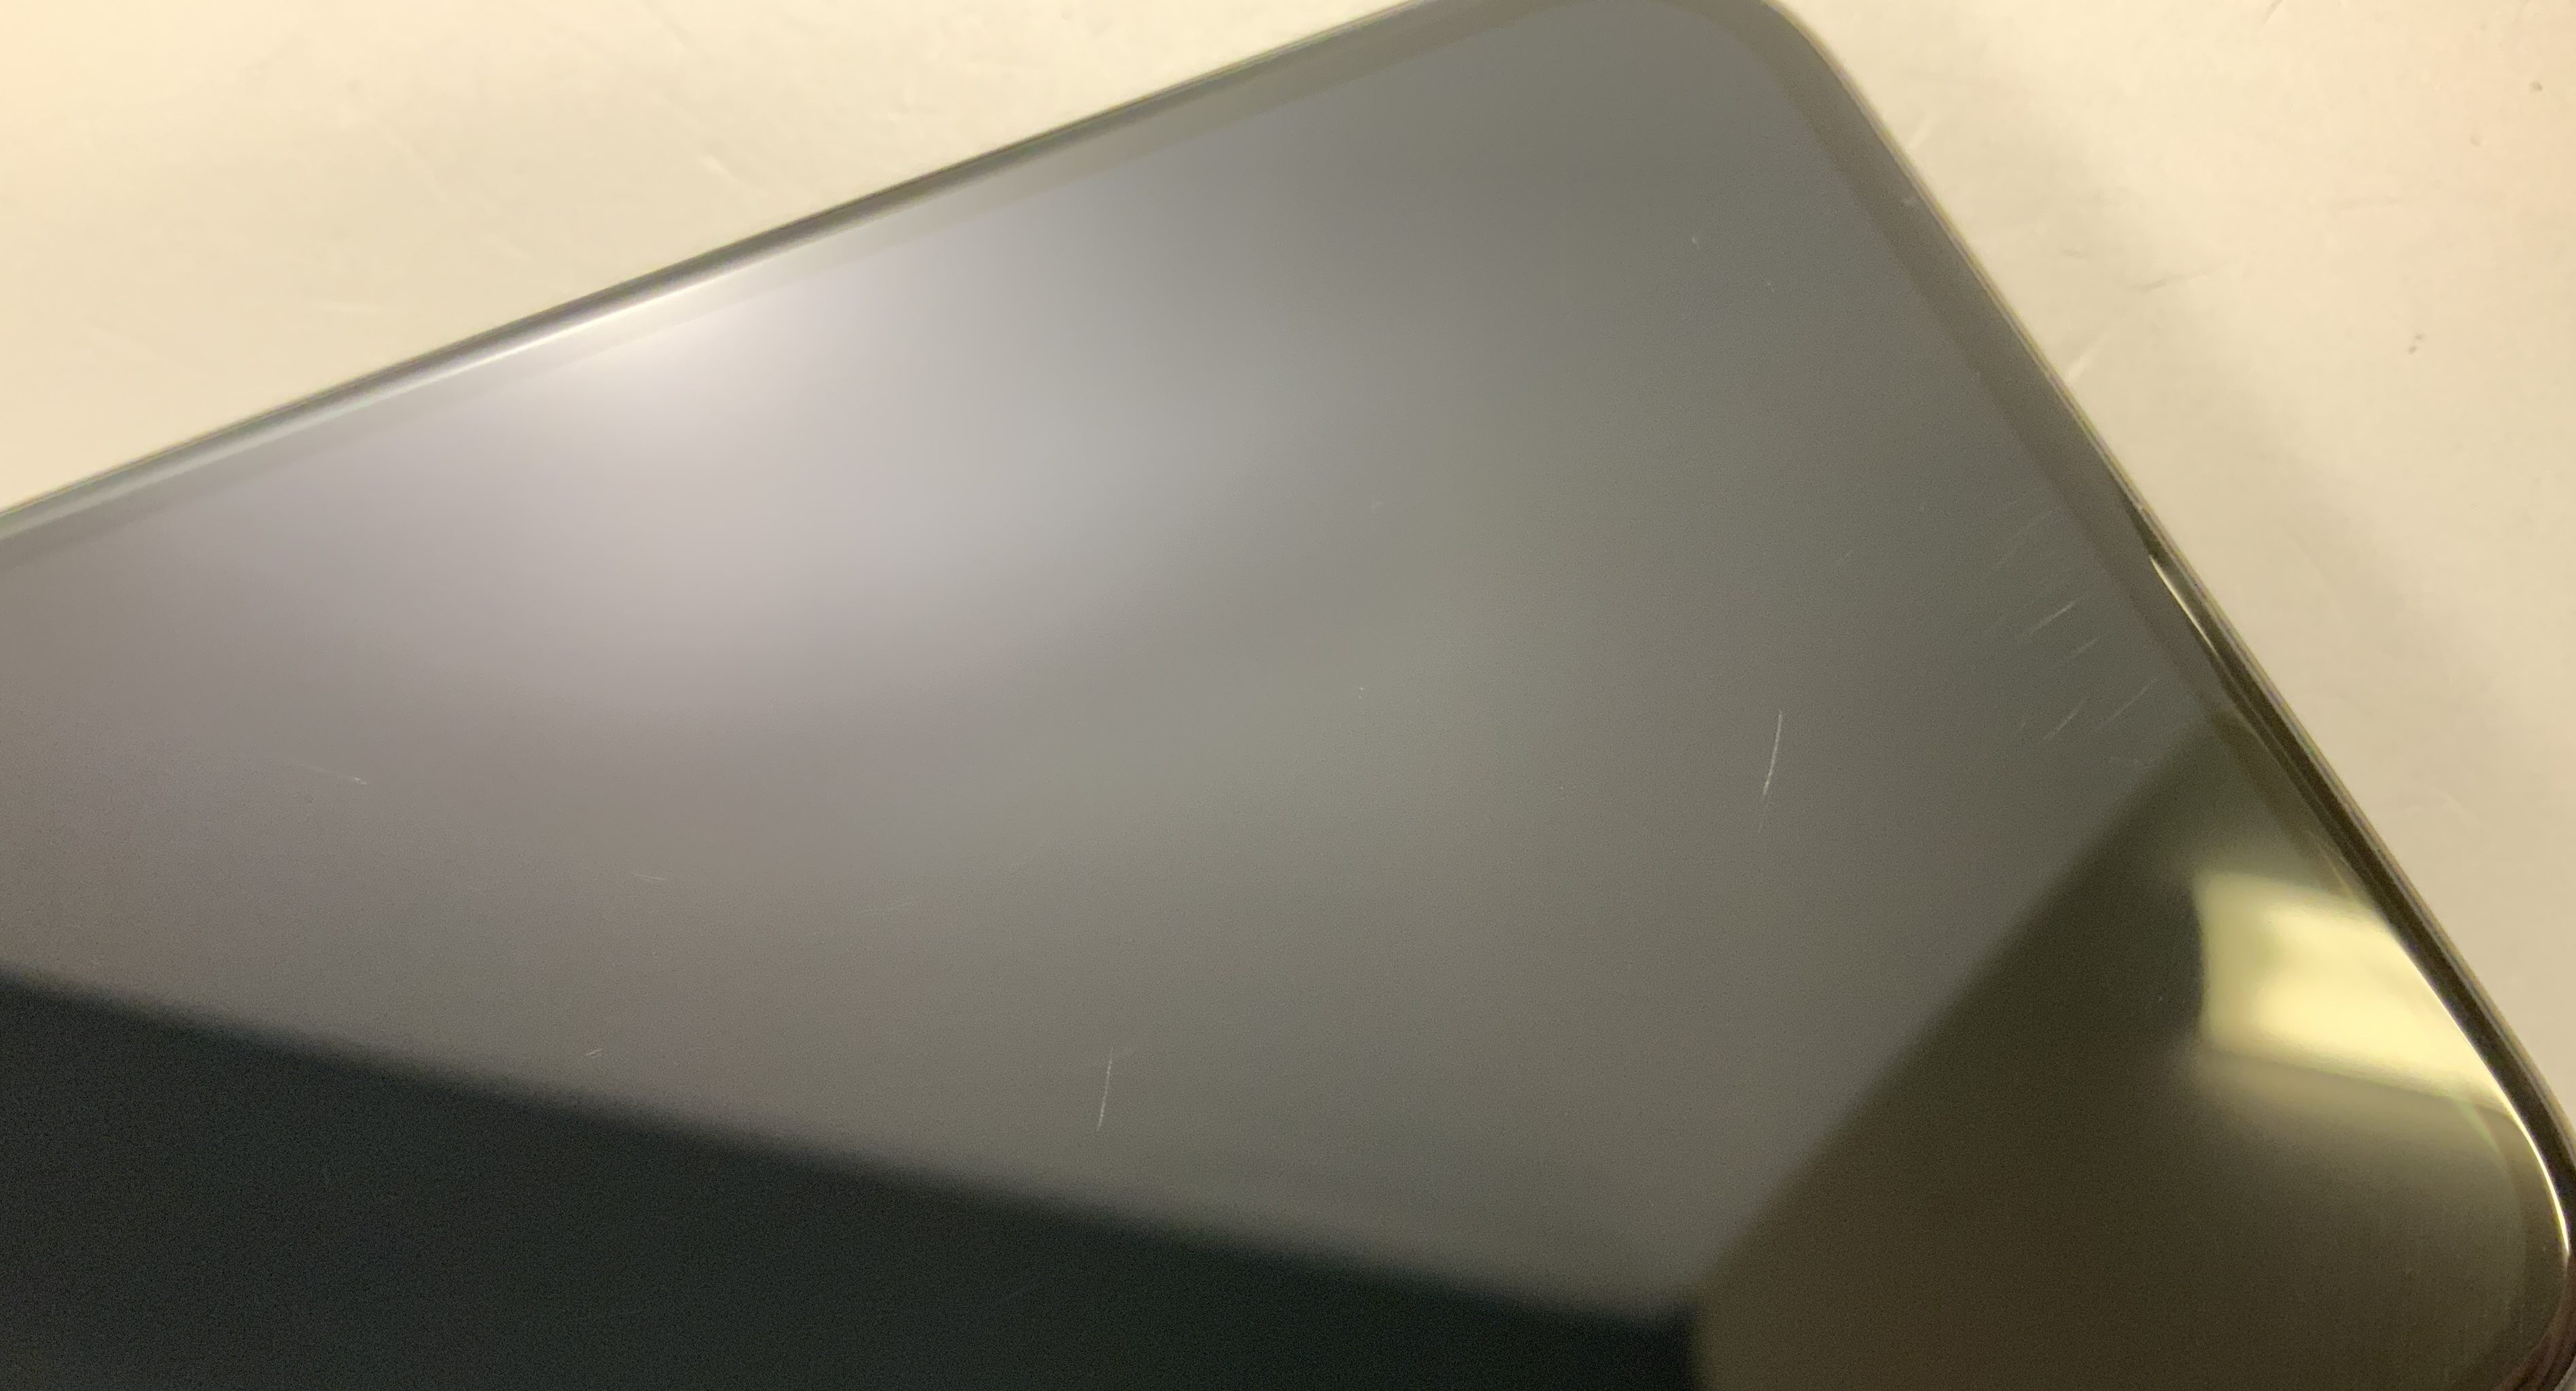 iPhone X 64GB, 64GB, Space Gray, Afbeelding 3